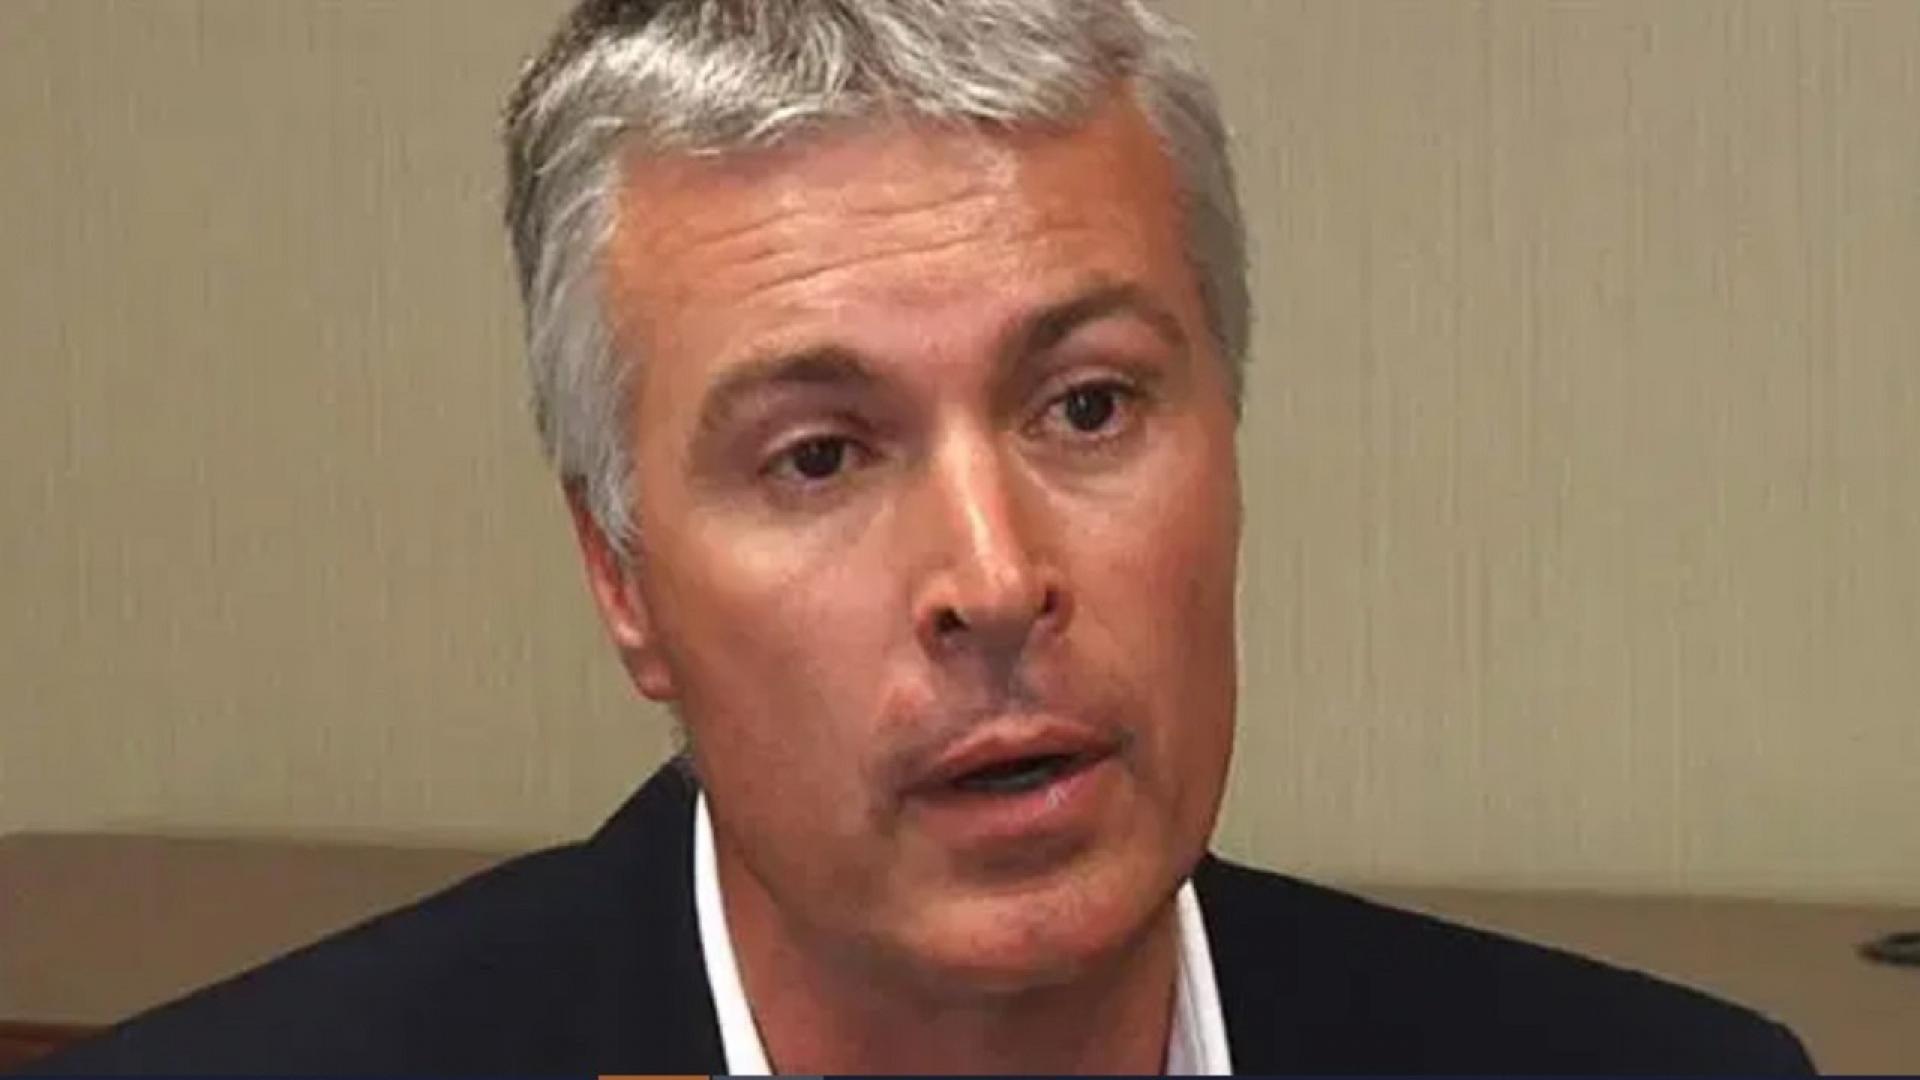 South Dakota South Dakota Attorney General Jason Ravnsborg is facing calls to resign.